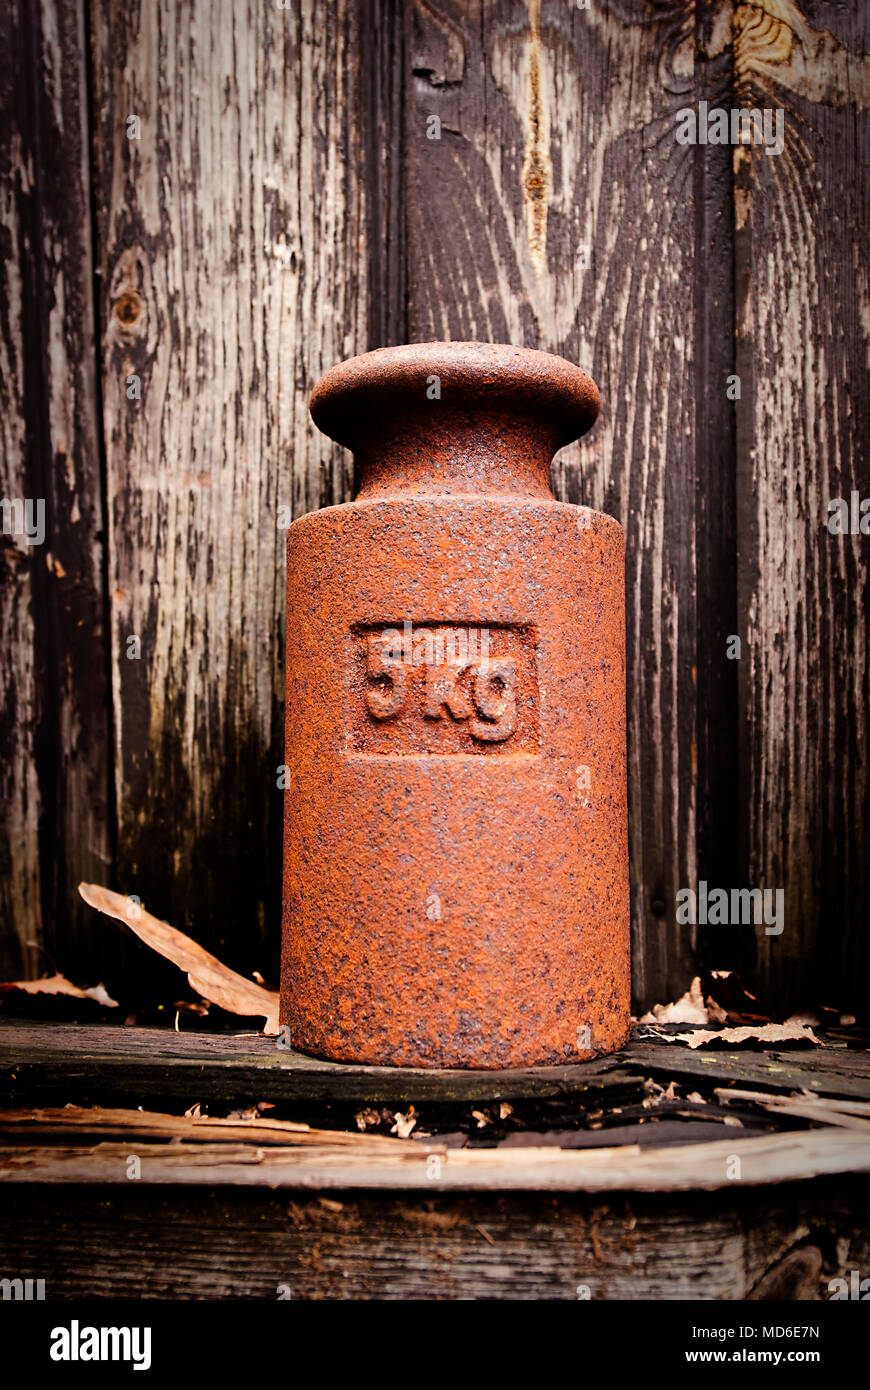 Vintage 5 kilograms calibration iron weight. - Stock Image